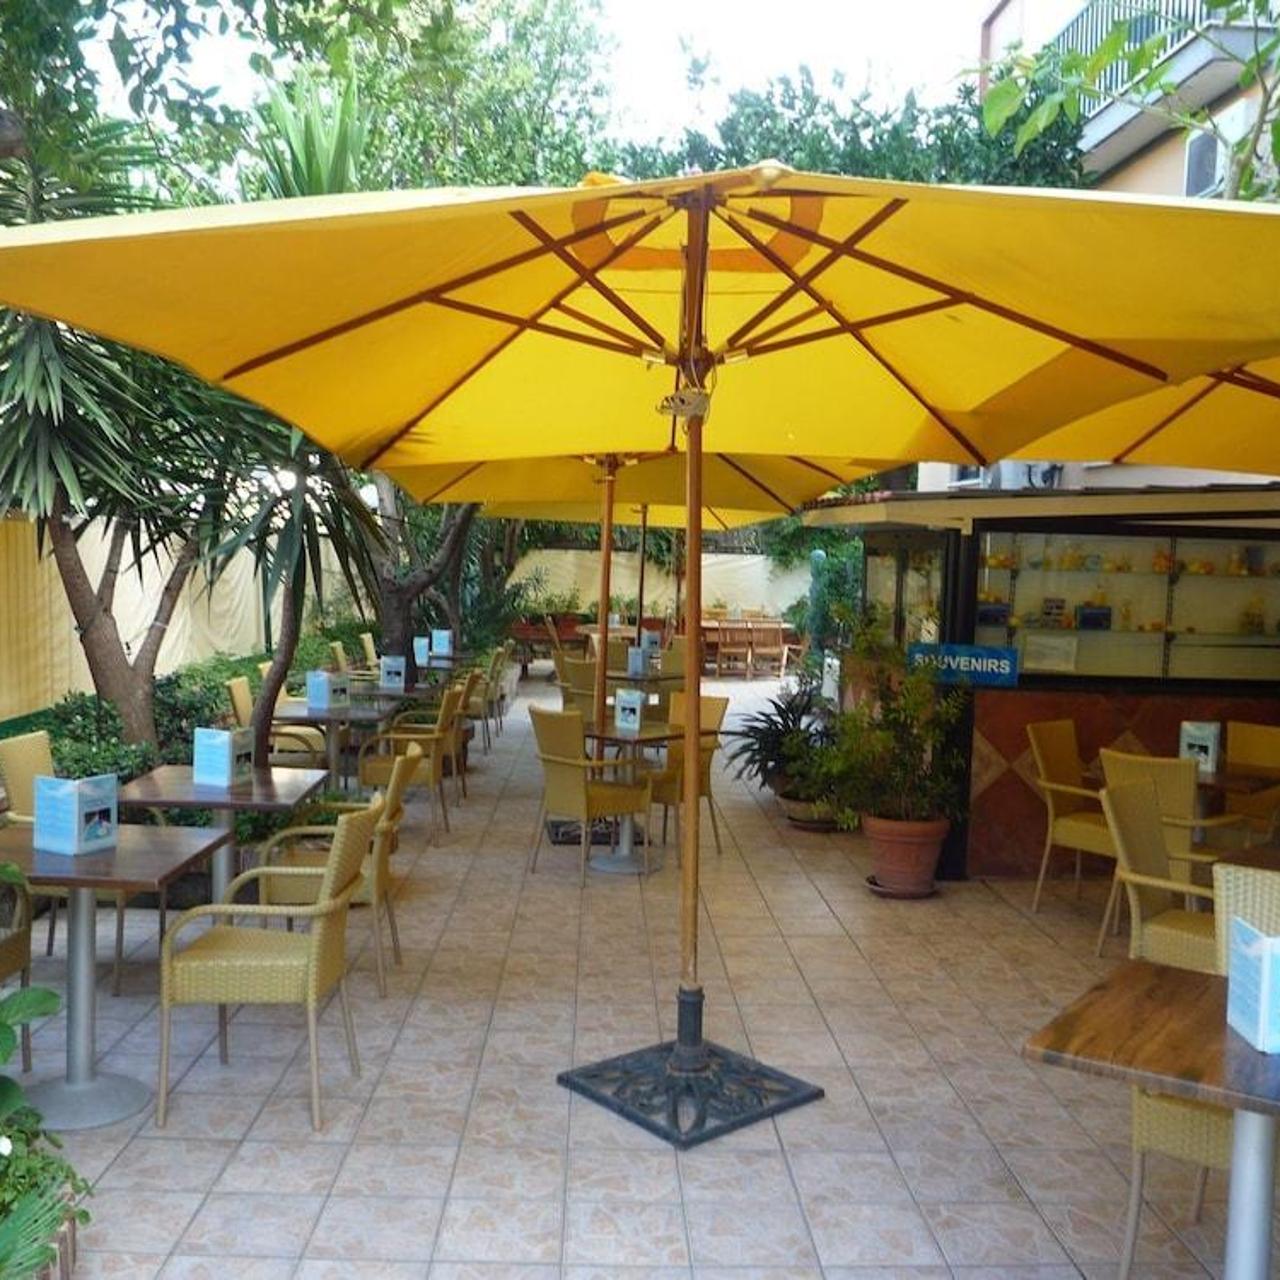 Hotel La Pergola 3 Hrs Star Hotel In Sorrento Campania